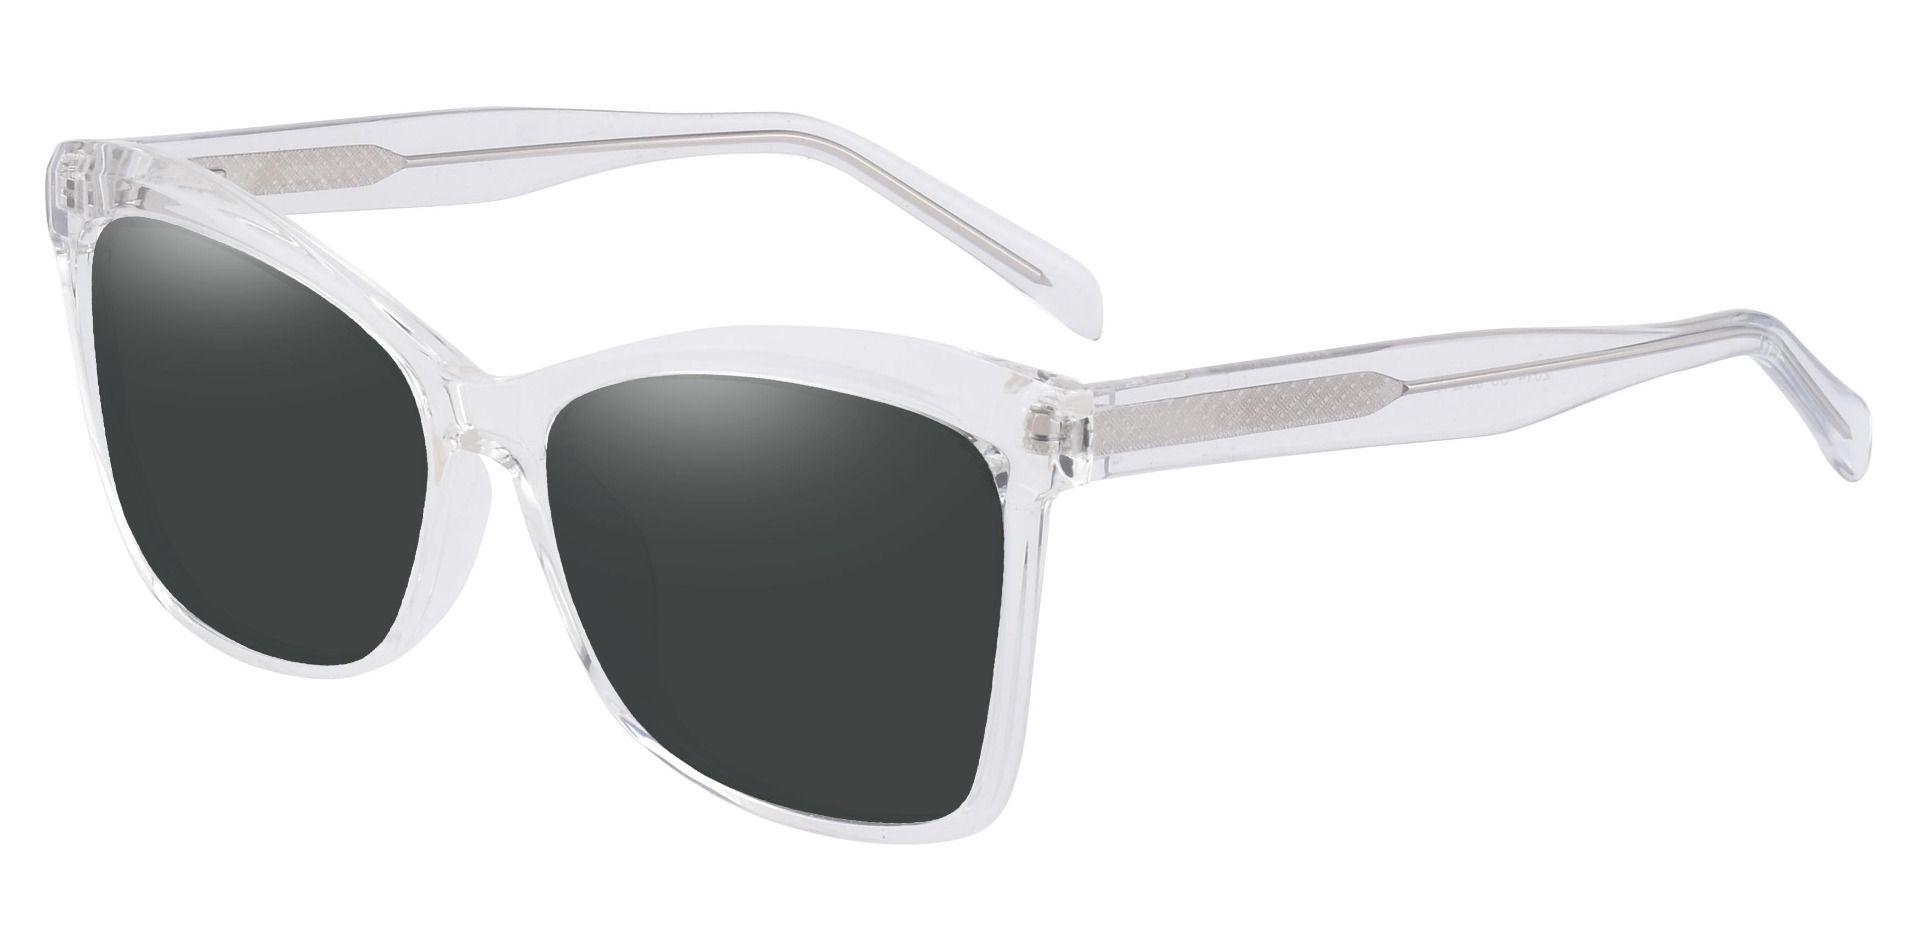 Lexi Cat Eye Prescription Sunglasses - Clear Frame With Gray Lenses